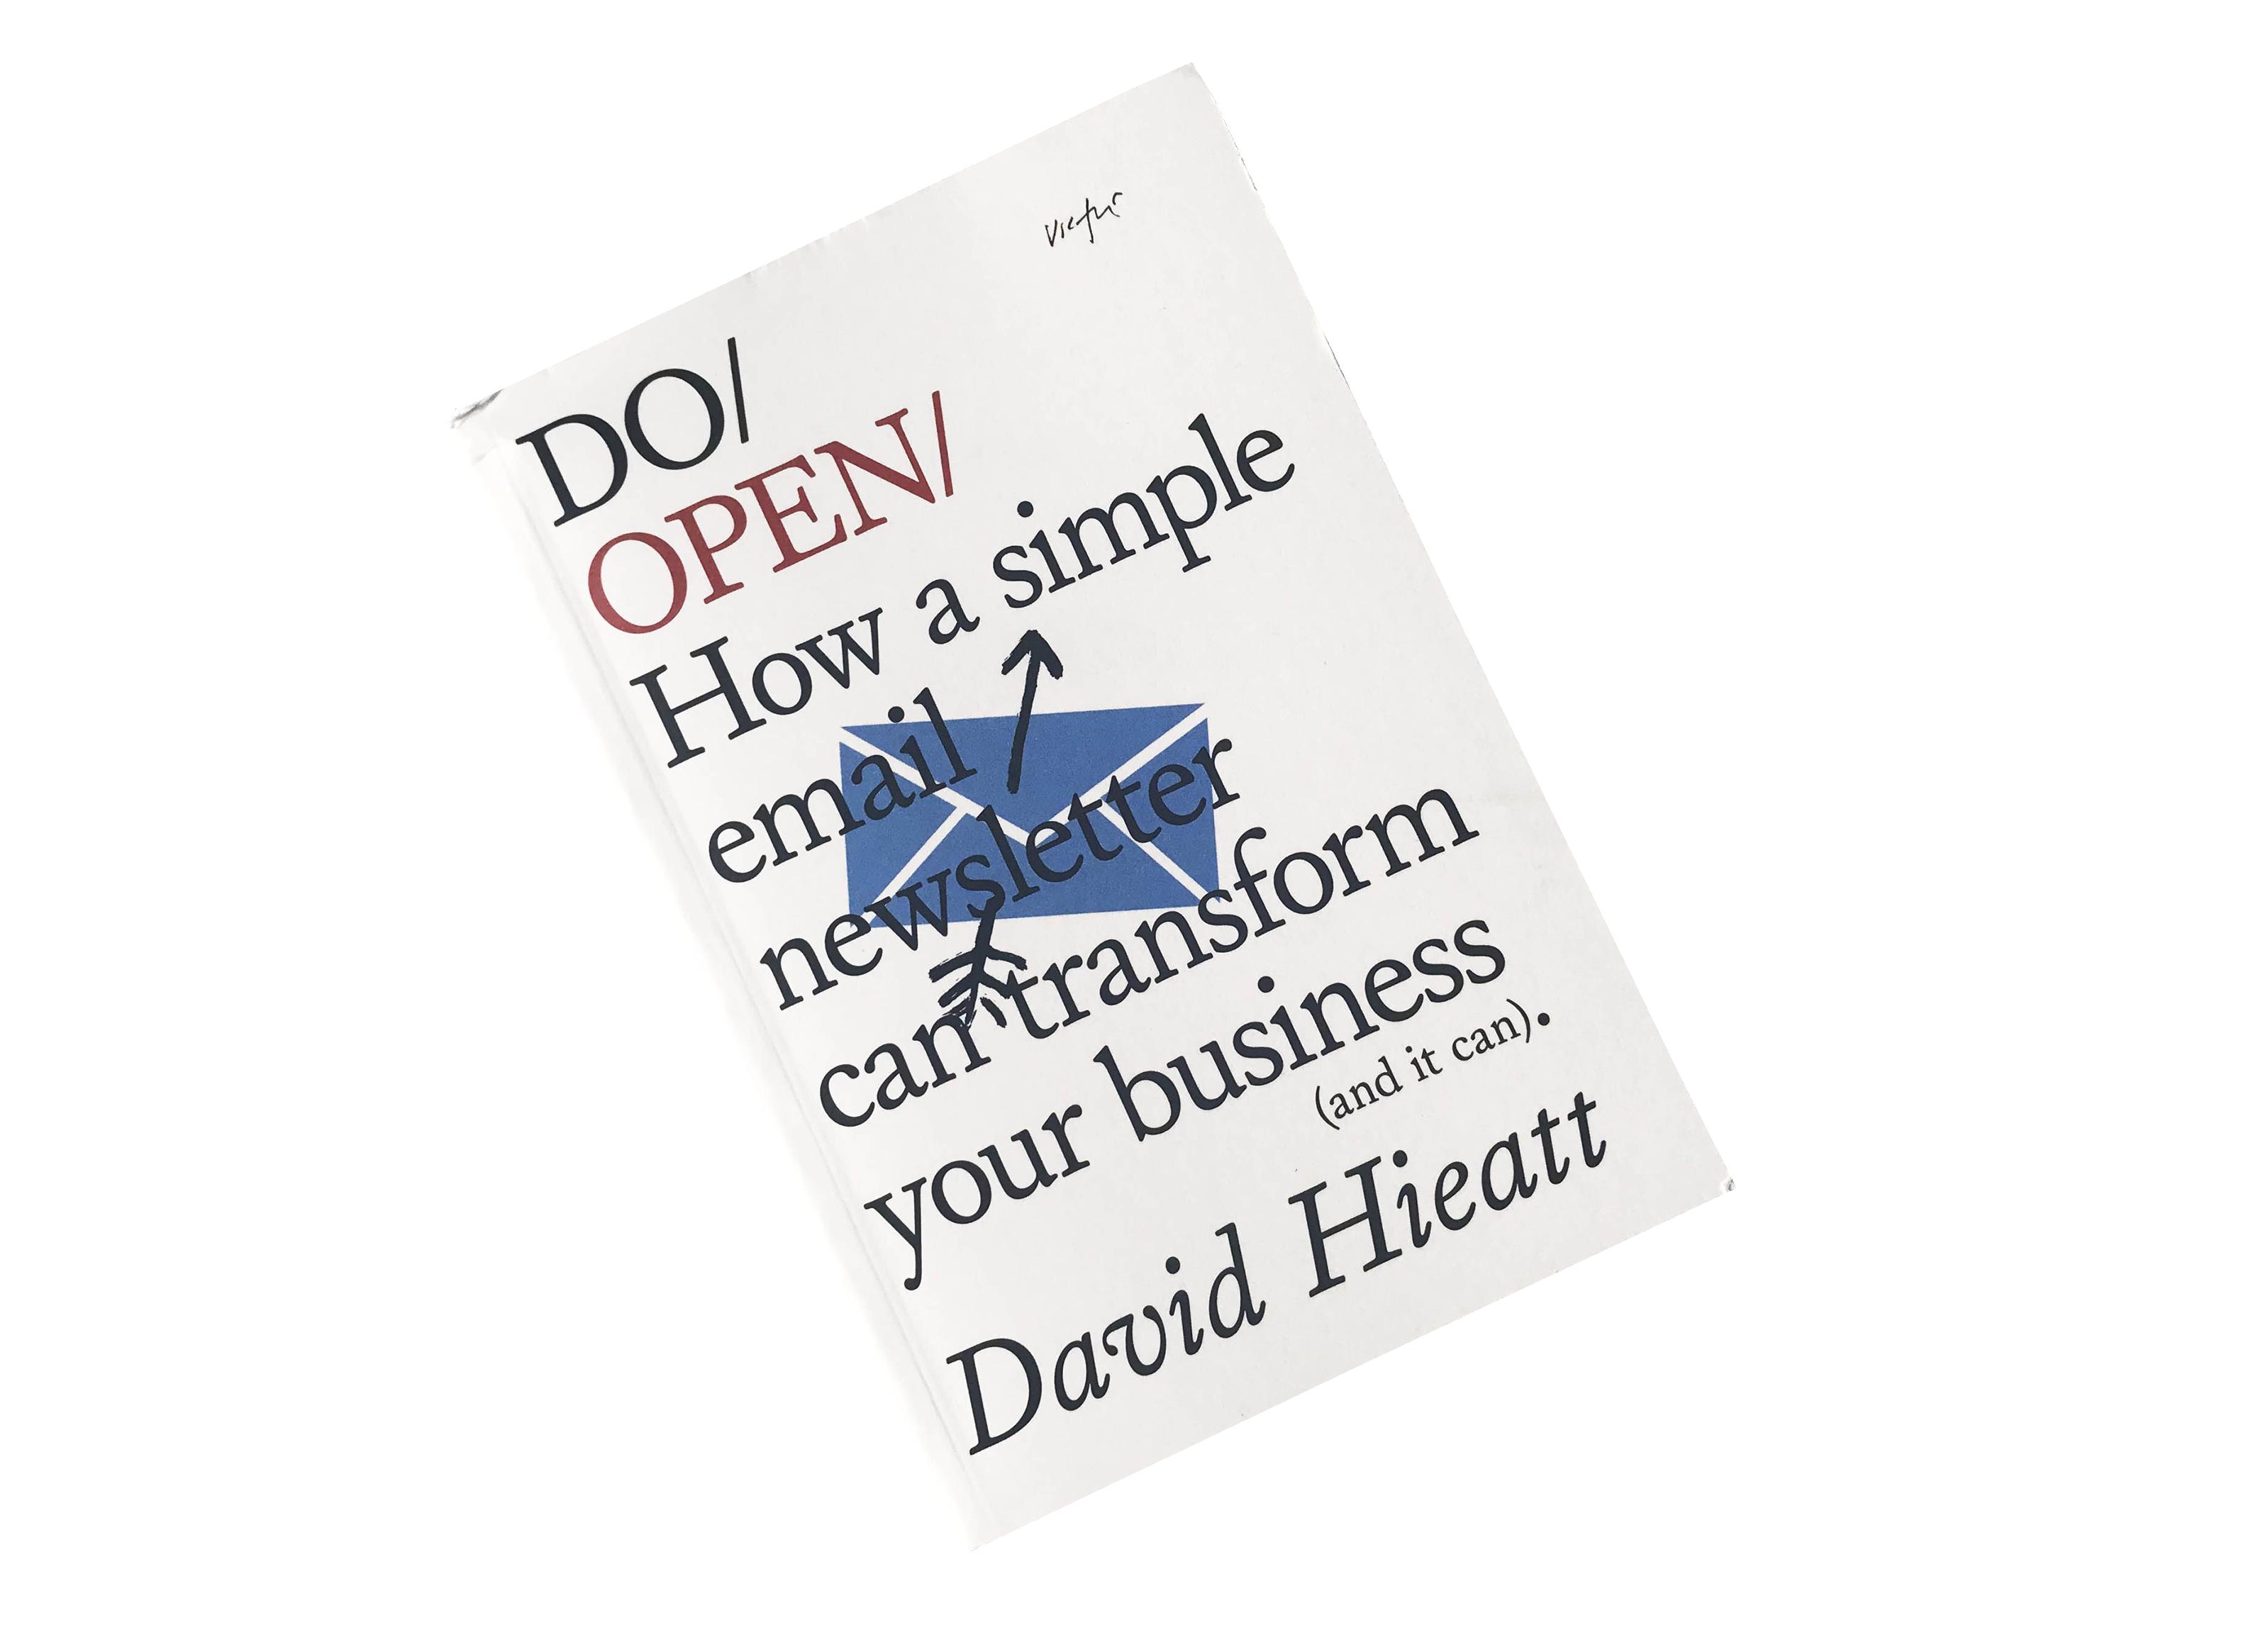 Do Open David Hieatt